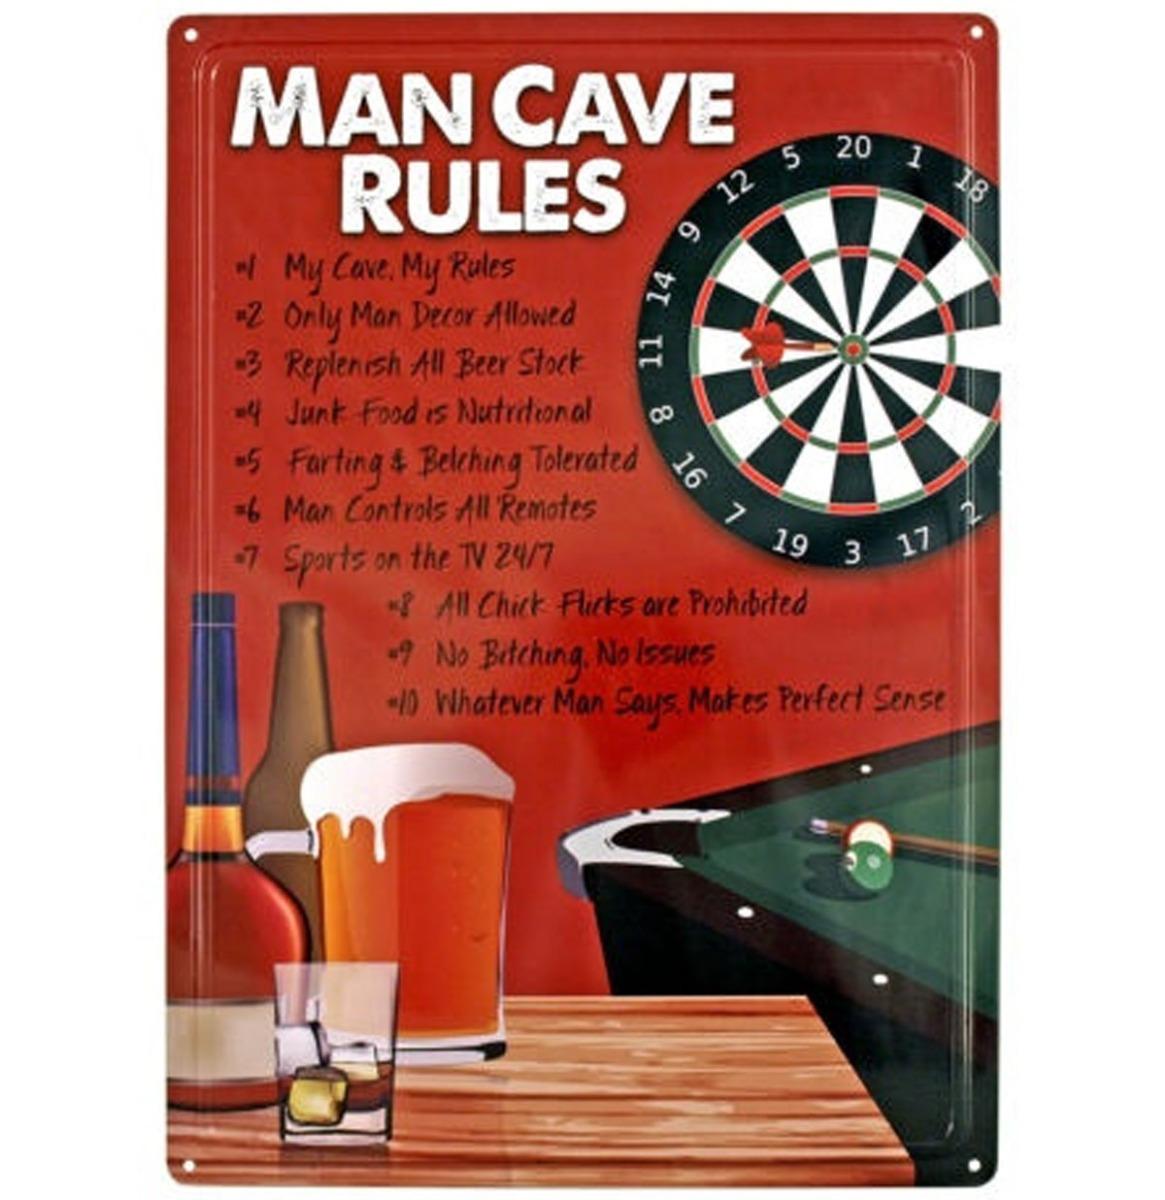 Man Cave Rules - Metalen Bord Met Reliëf - 43 x 31 cm